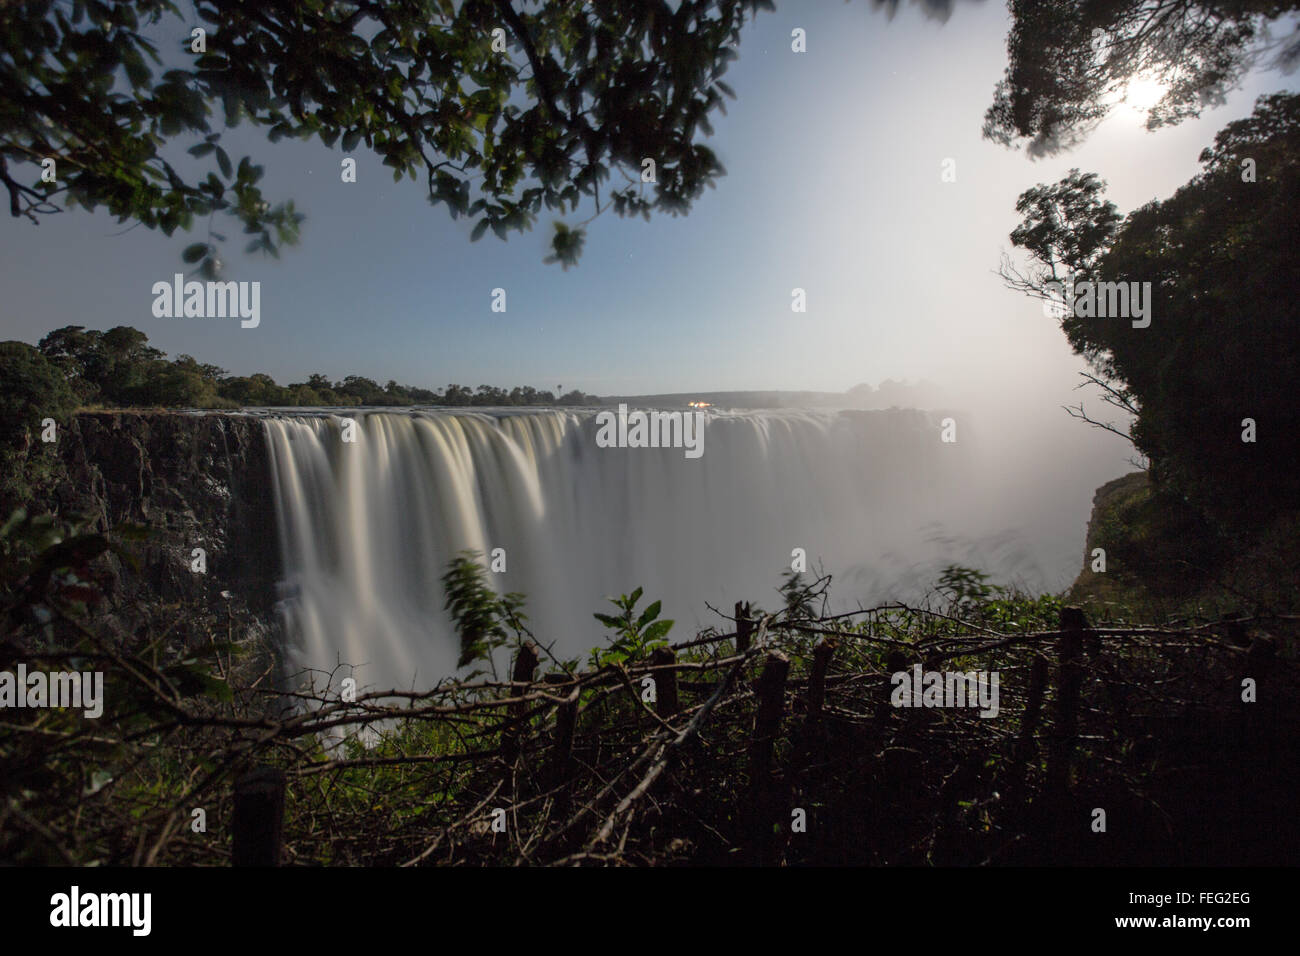 Lunar iridata a Victoria falls Immagini Stock